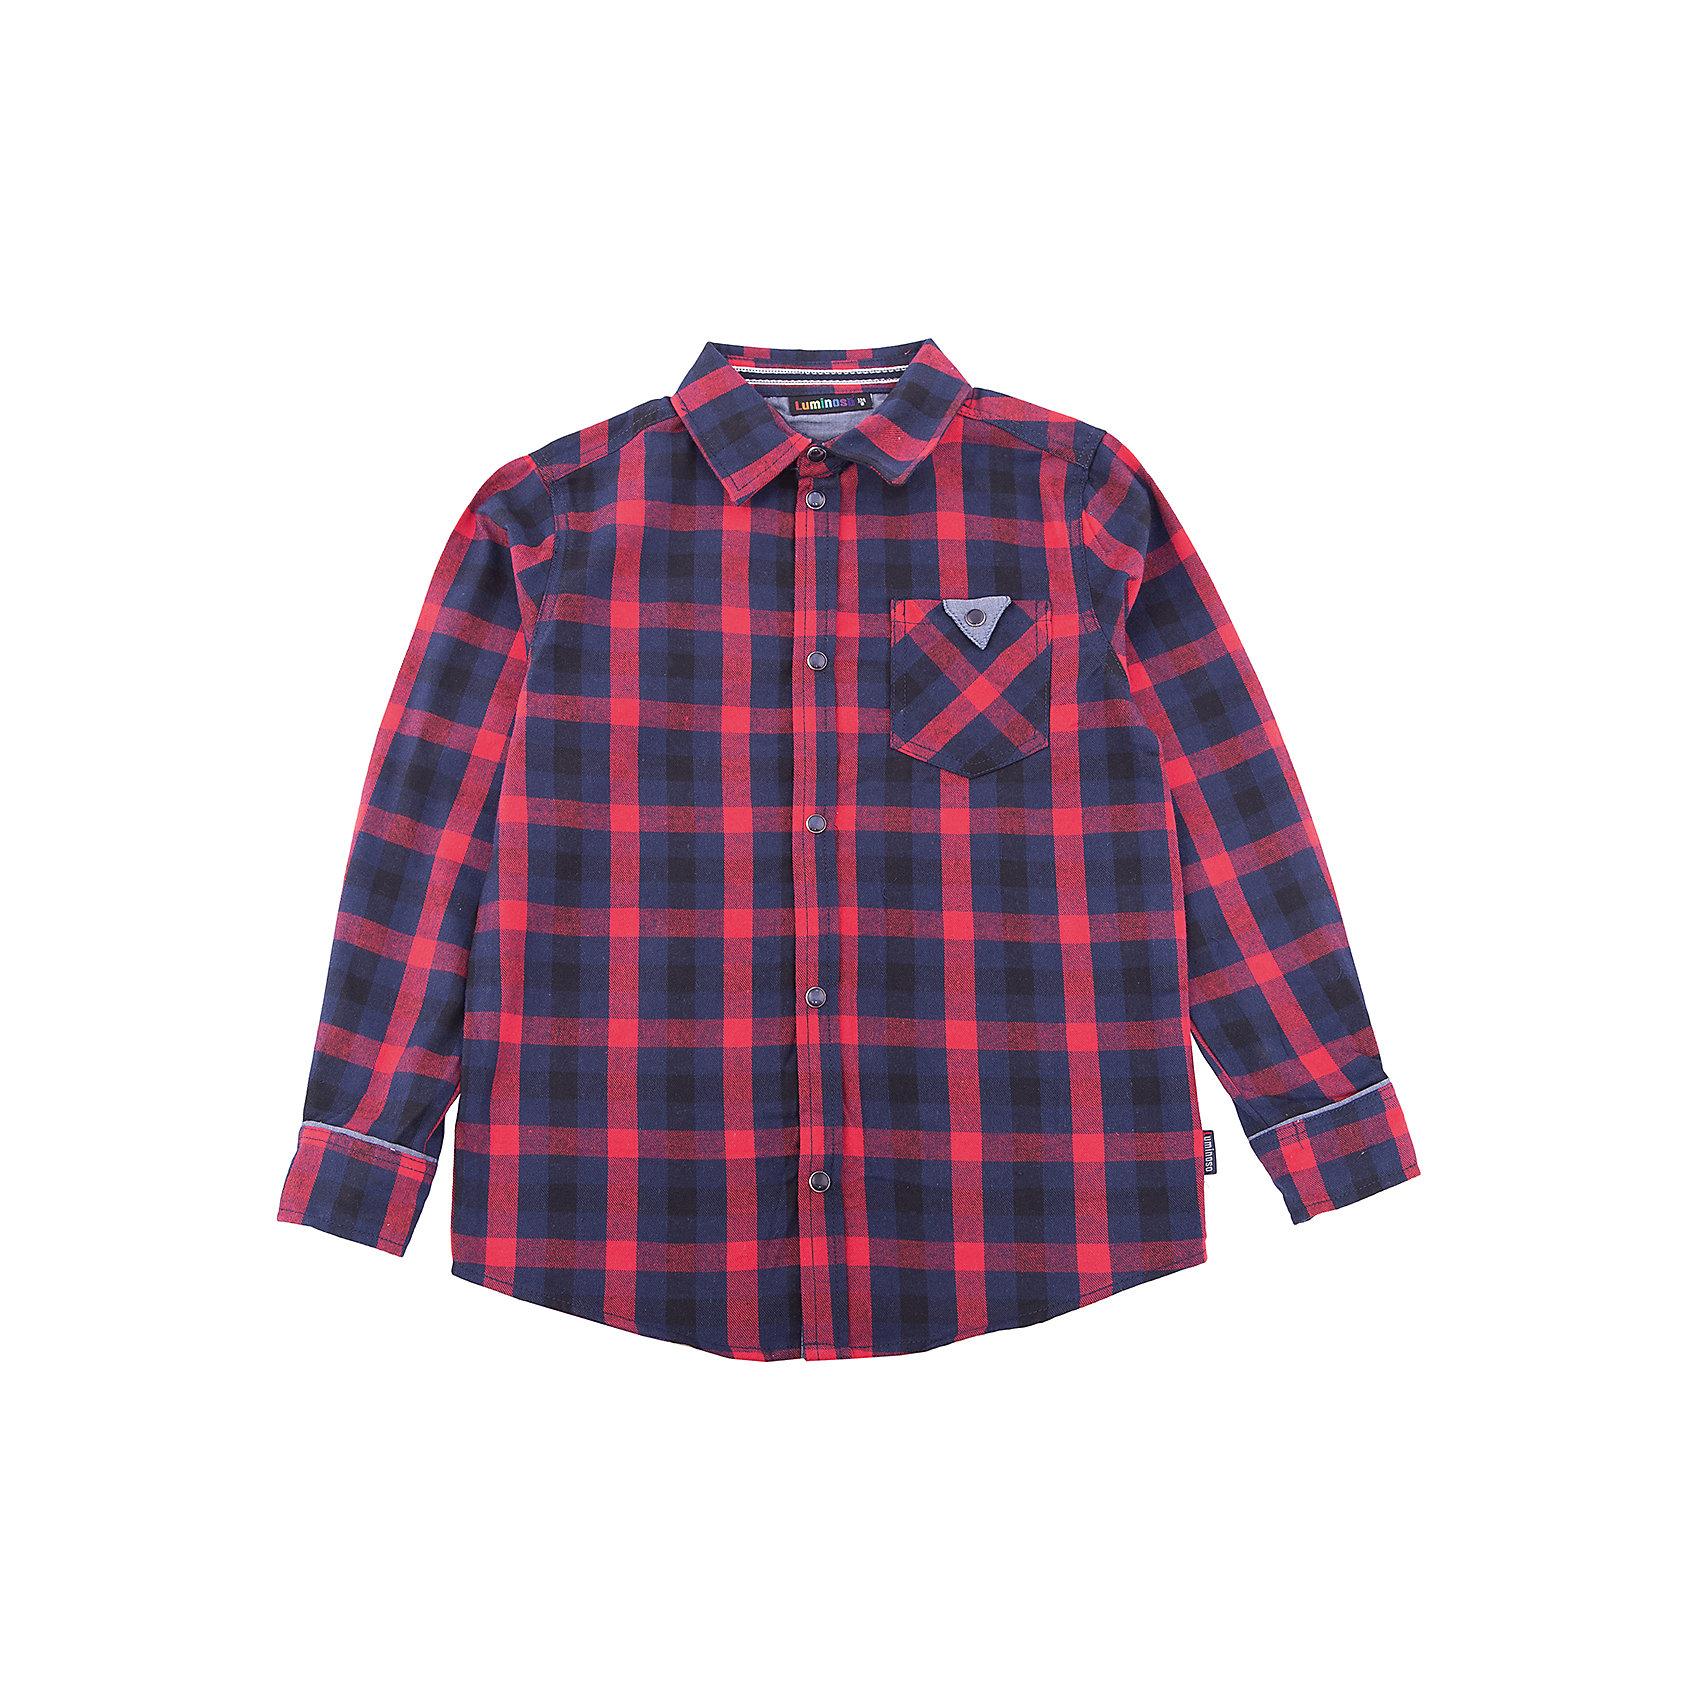 Рубашка Luminoso для мальчикаБлузки и рубашки<br>Рубашка Luminoso для мальчика<br><br>Состав:<br>100% хлопок<br><br>Ширина мм: 174<br>Глубина мм: 10<br>Высота мм: 169<br>Вес г: 157<br>Цвет: синий<br>Возраст от месяцев: 156<br>Возраст до месяцев: 168<br>Пол: Мужской<br>Возраст: Детский<br>Размер: 164,134,140,146,152,158<br>SKU: 7097082